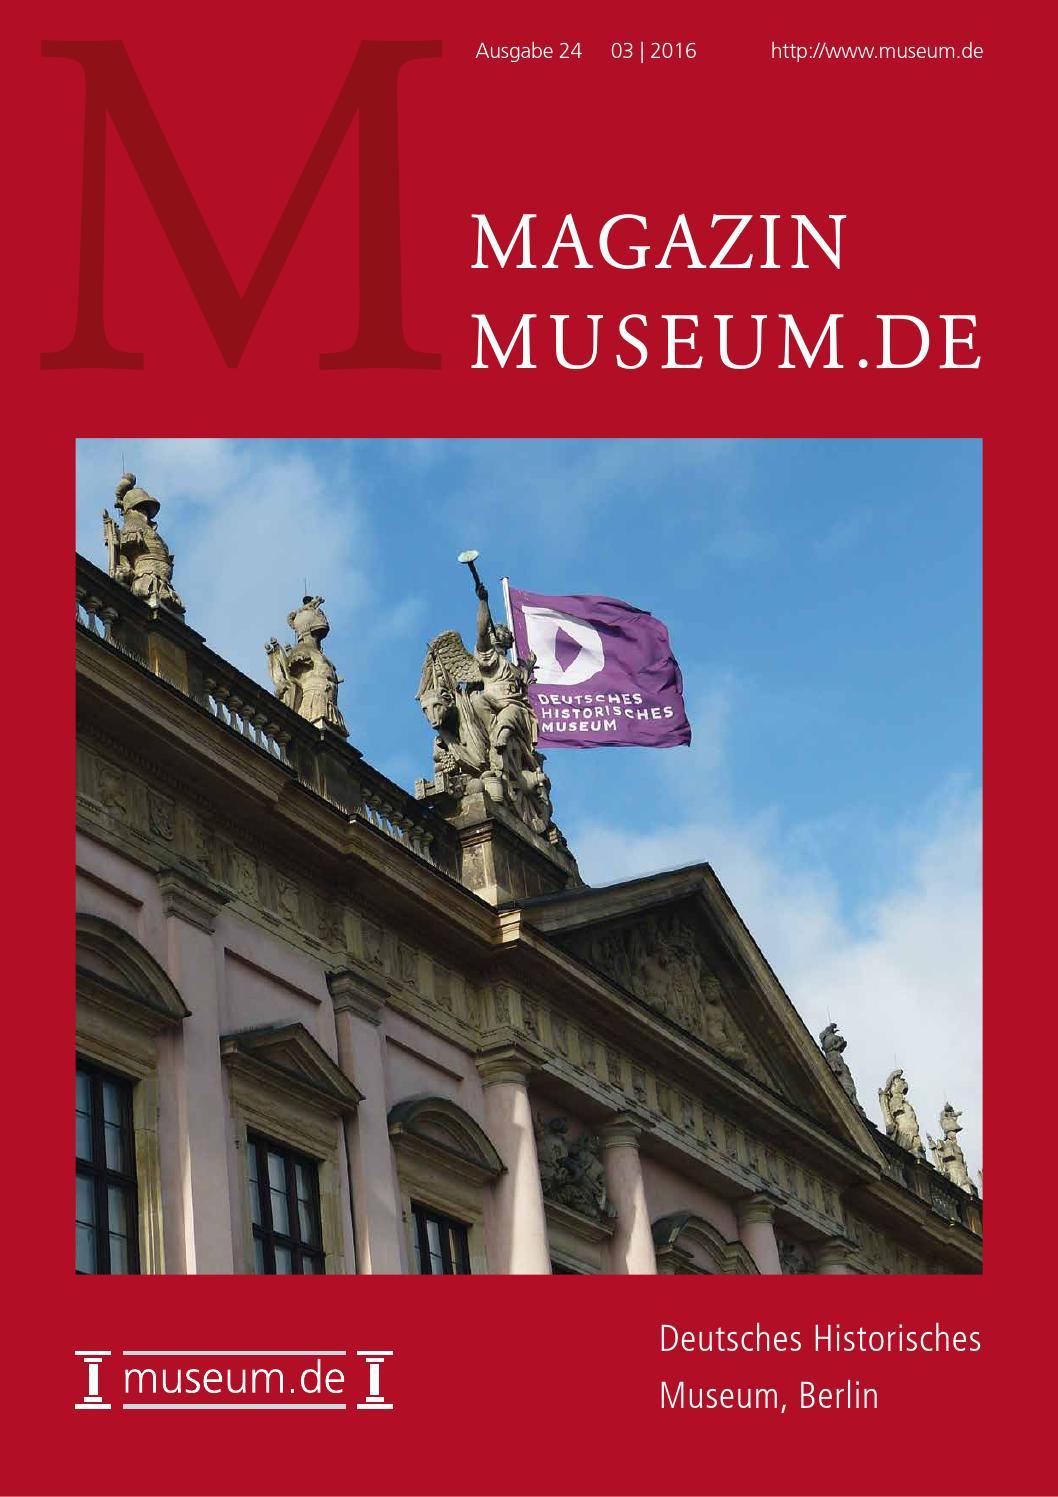 Magazin Museum.de Nr. 24 by museum.de - issuu